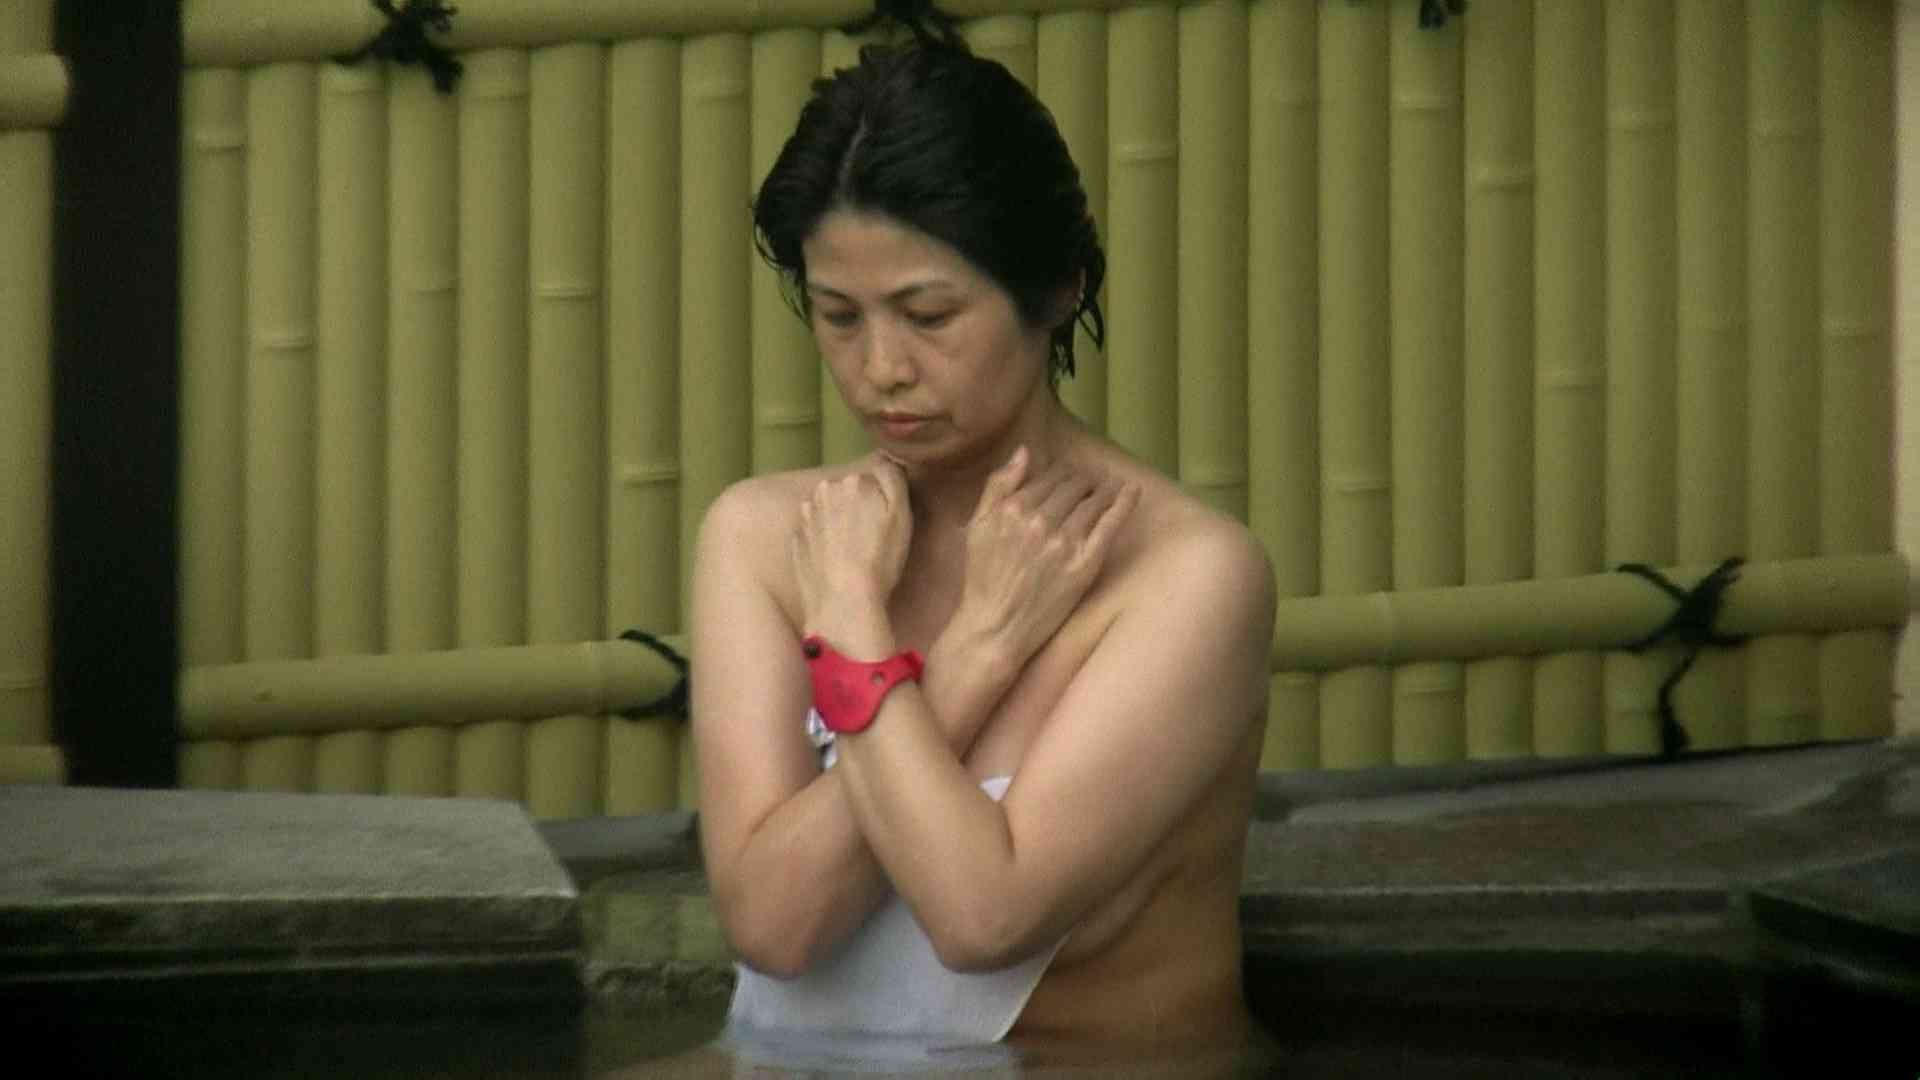 Aquaな露天風呂Vol.636 0  45連発 20